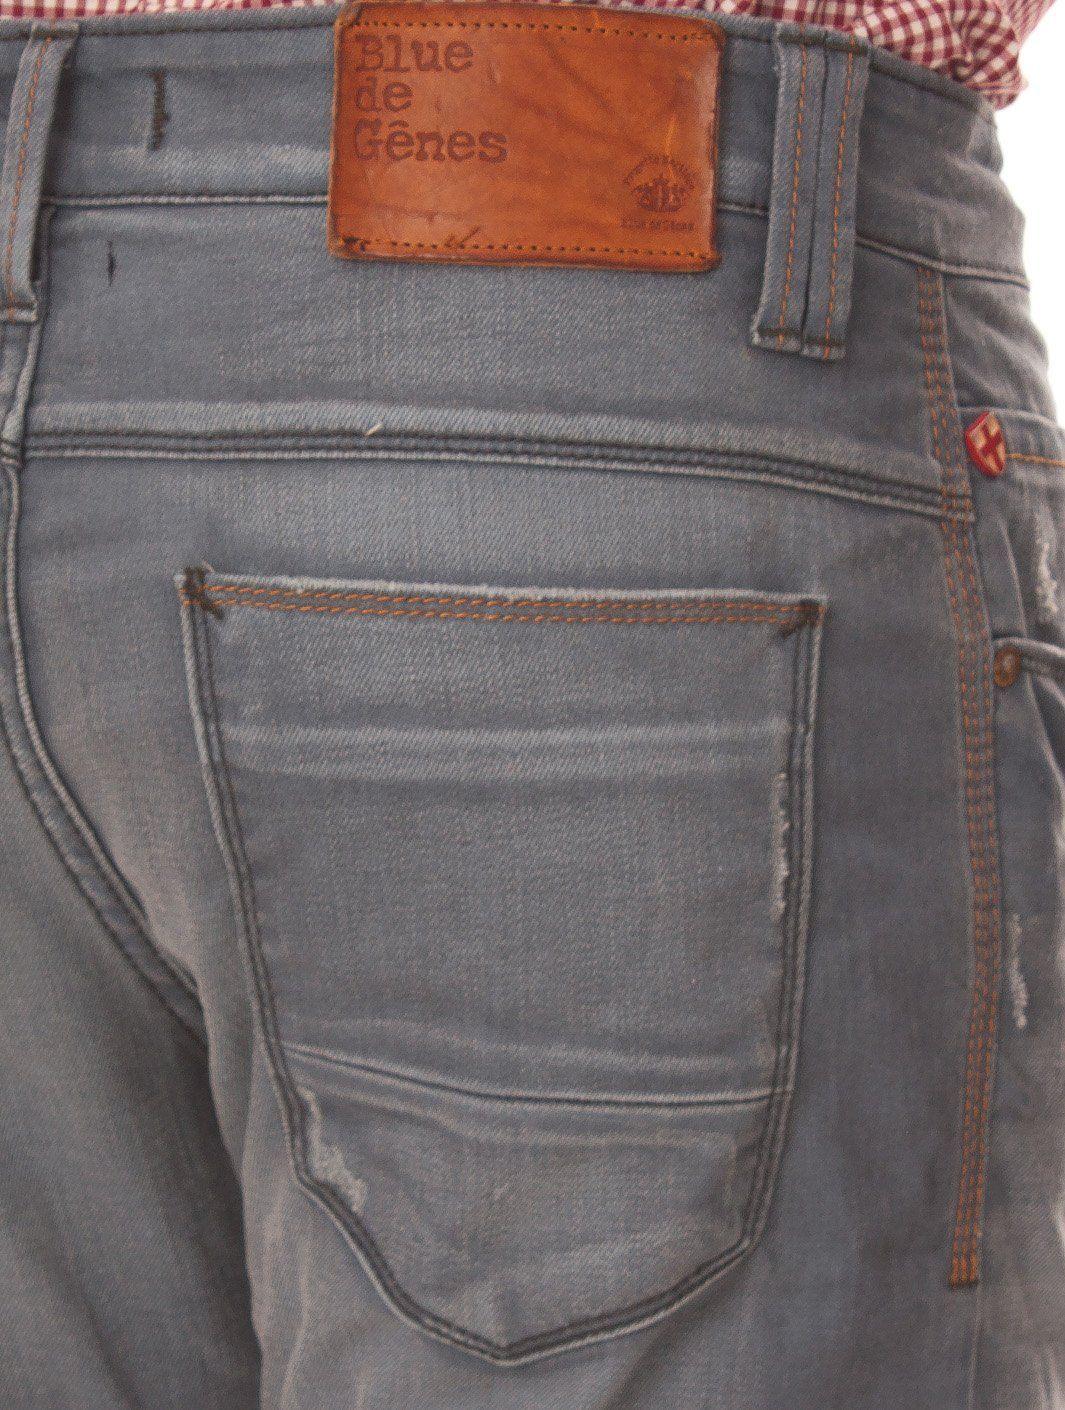 jeans paulo hickory blue de genes clothes pinterest. Black Bedroom Furniture Sets. Home Design Ideas